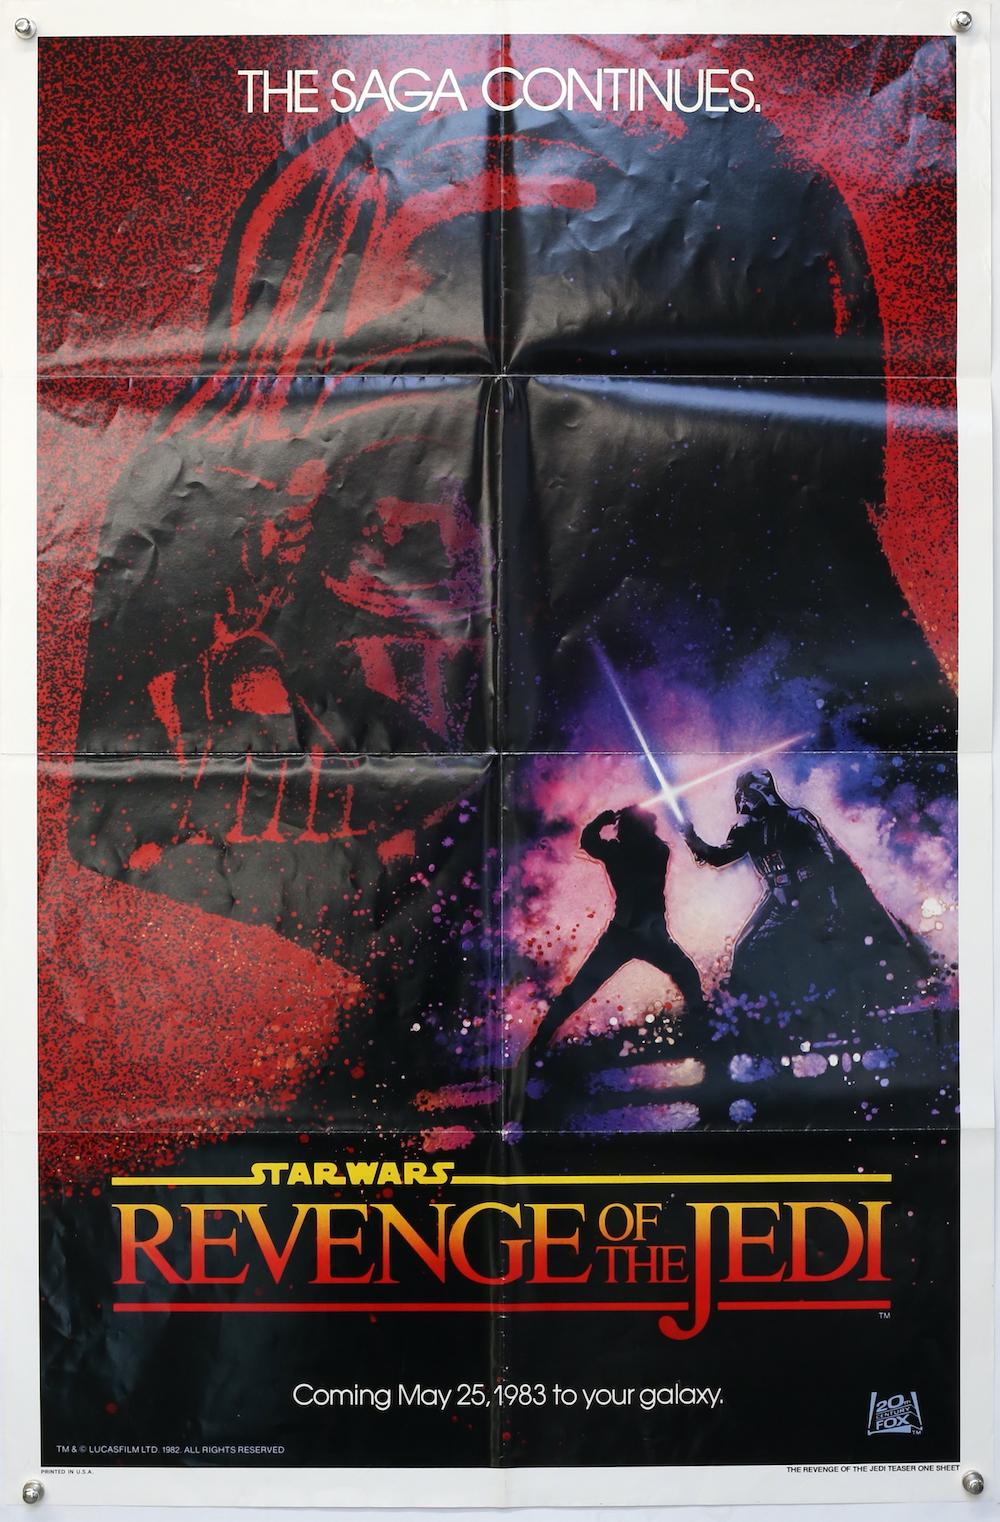 Original Revenge of the Jedi Star Wars film